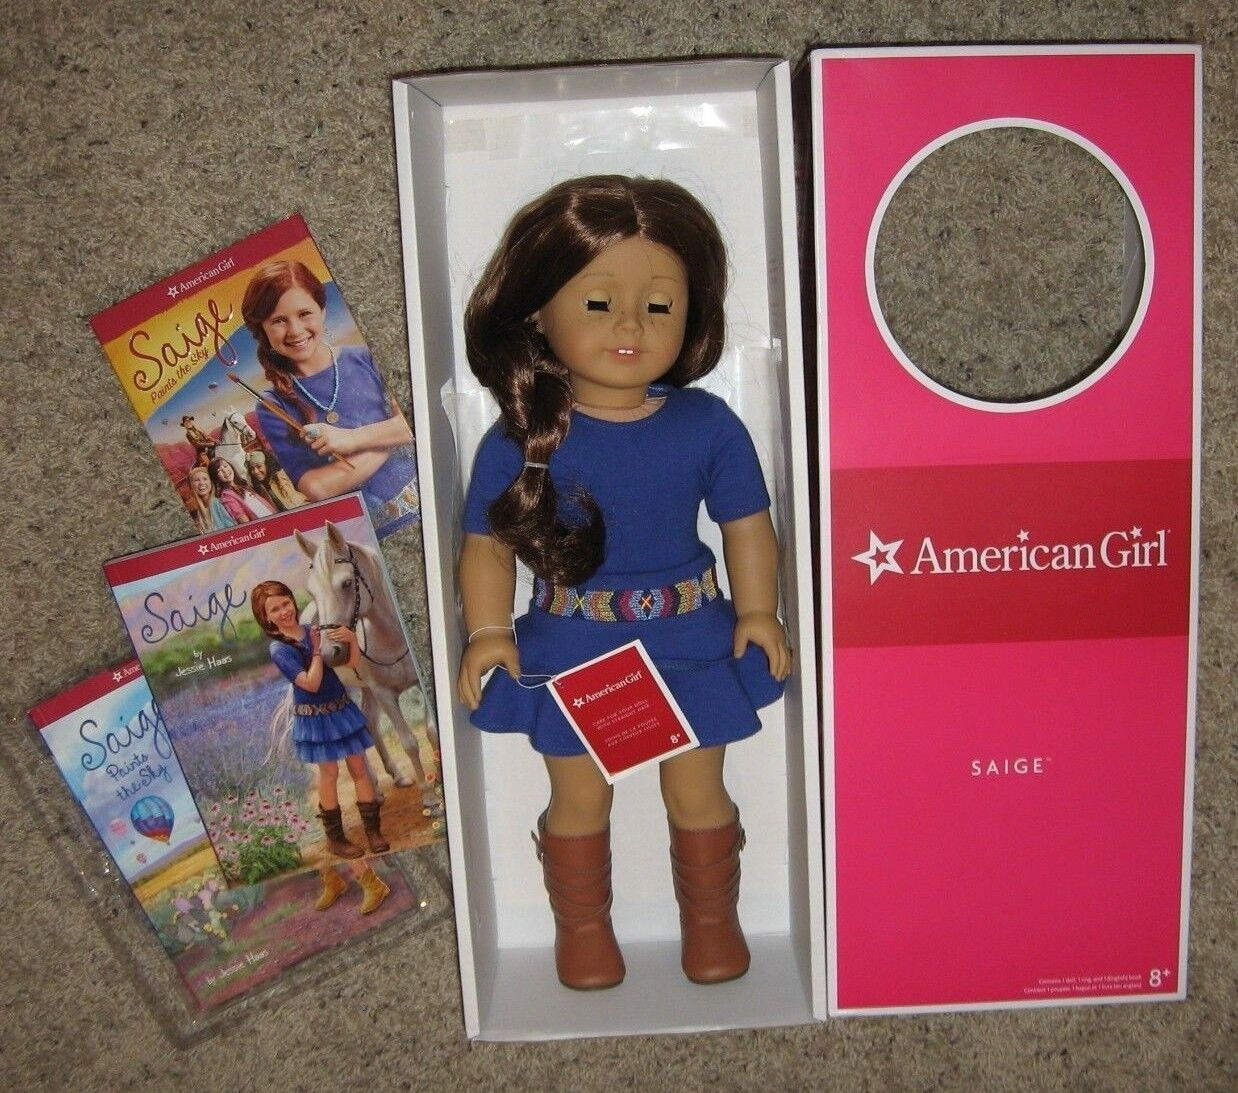 NMIB Muñeca American Girl 18 Saige & satisfacer Outfit 2 Libros Cd Caja Original orejas perforadas